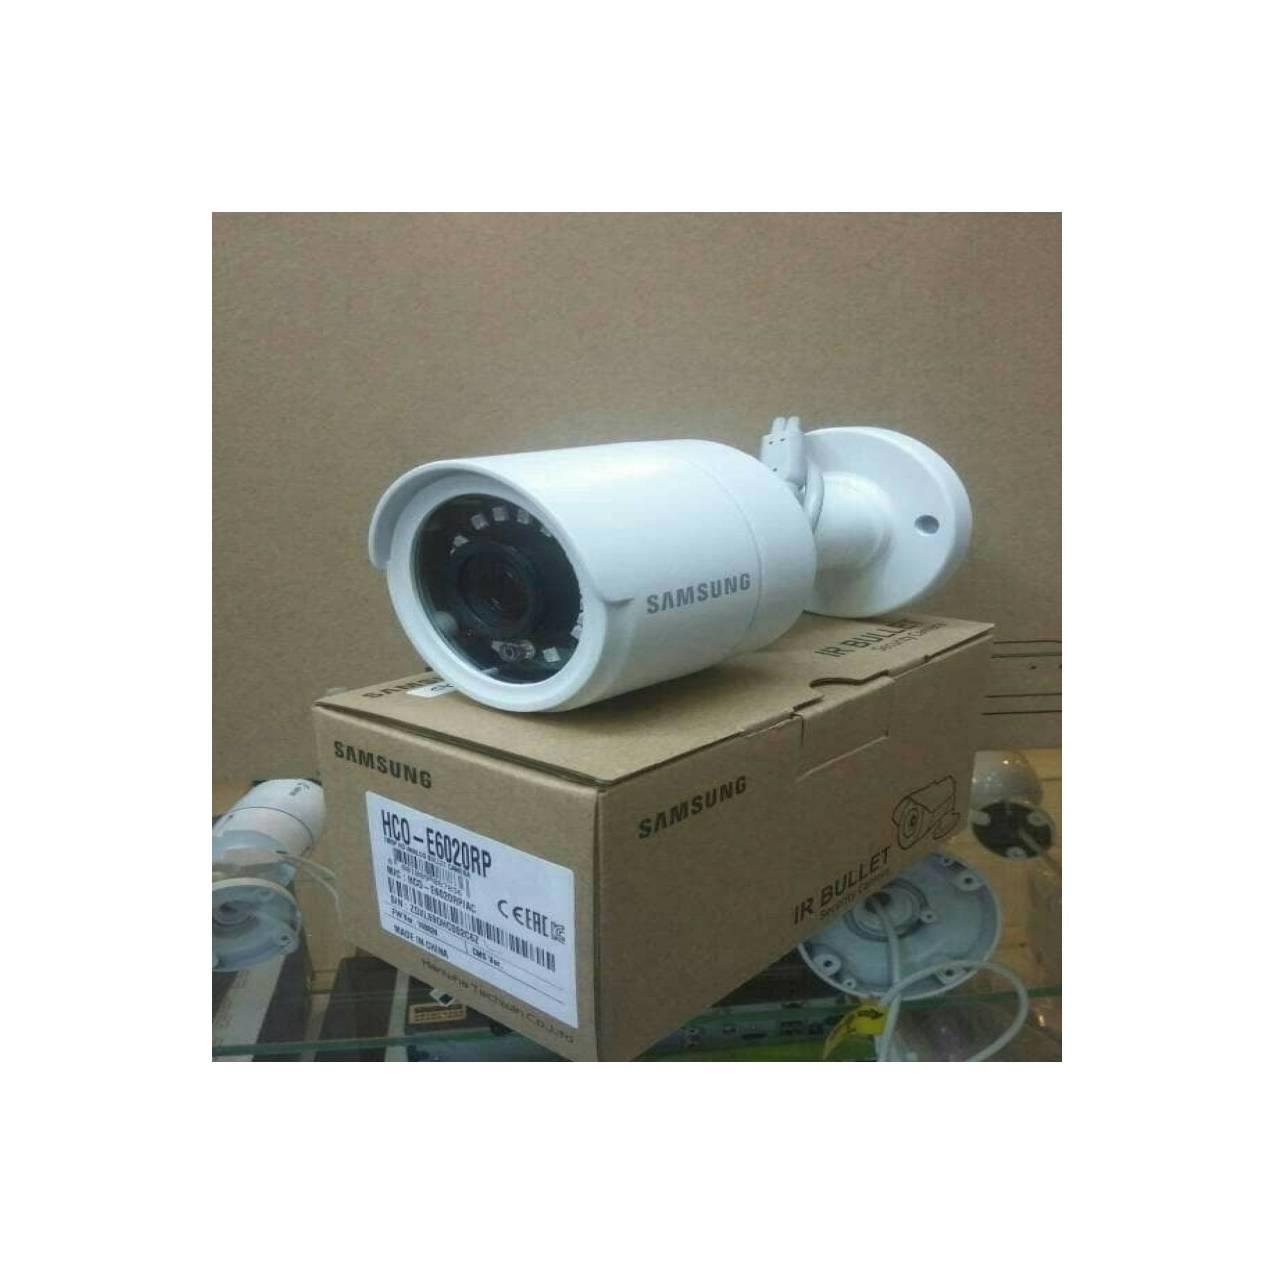 KAMERA CCTV SAMSUNG 2MP FULL HD HCO-E6020RP OUTDOOR MURAH